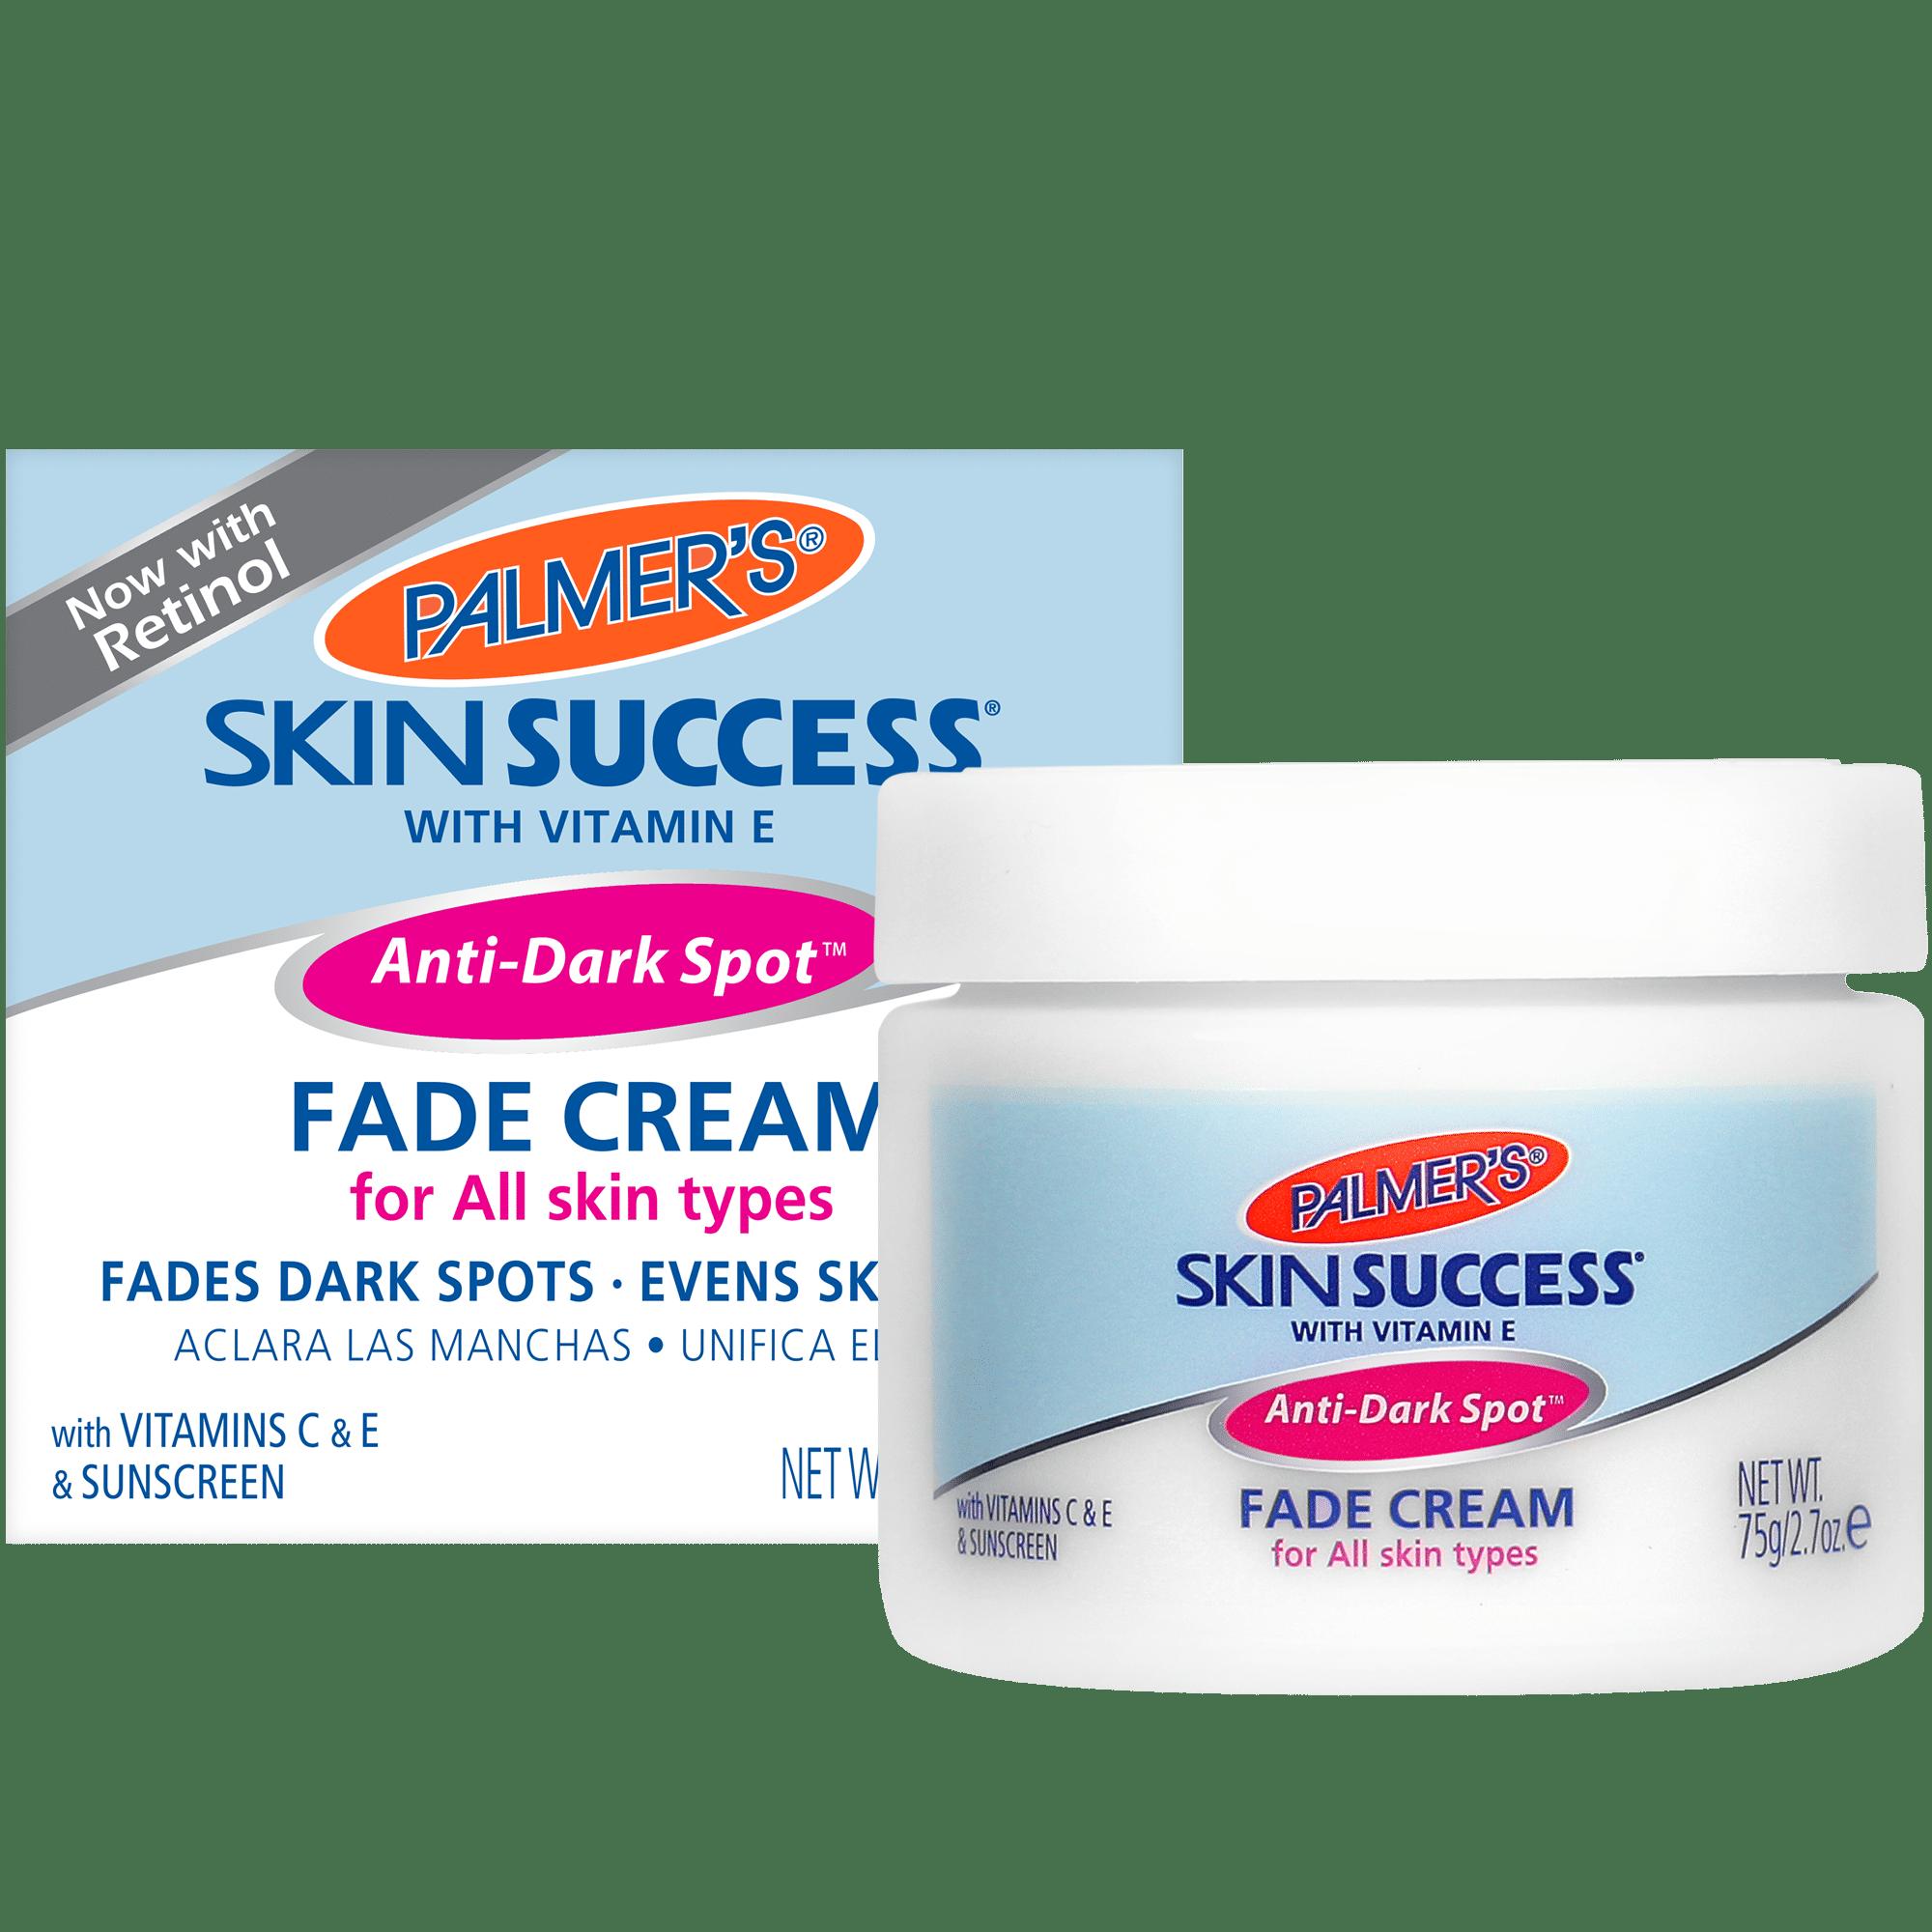 Palmer's Skin Success Anti-dark Spot Fade Cream For All Skin Types - 75g